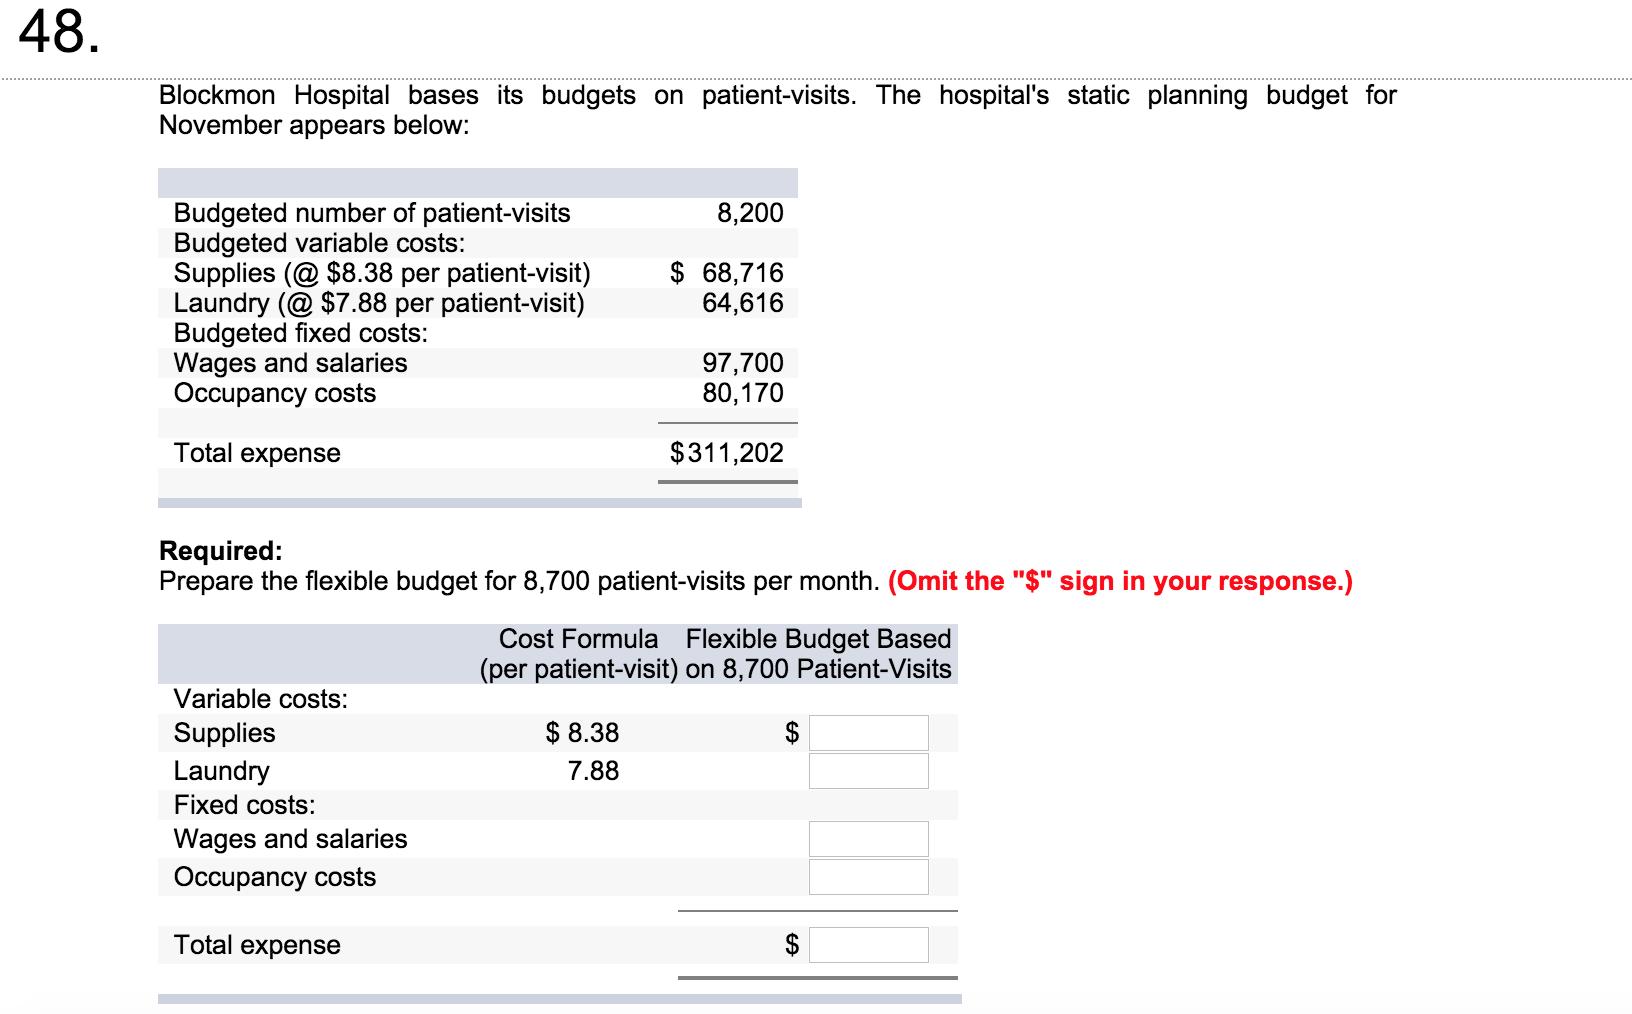 static planning budget